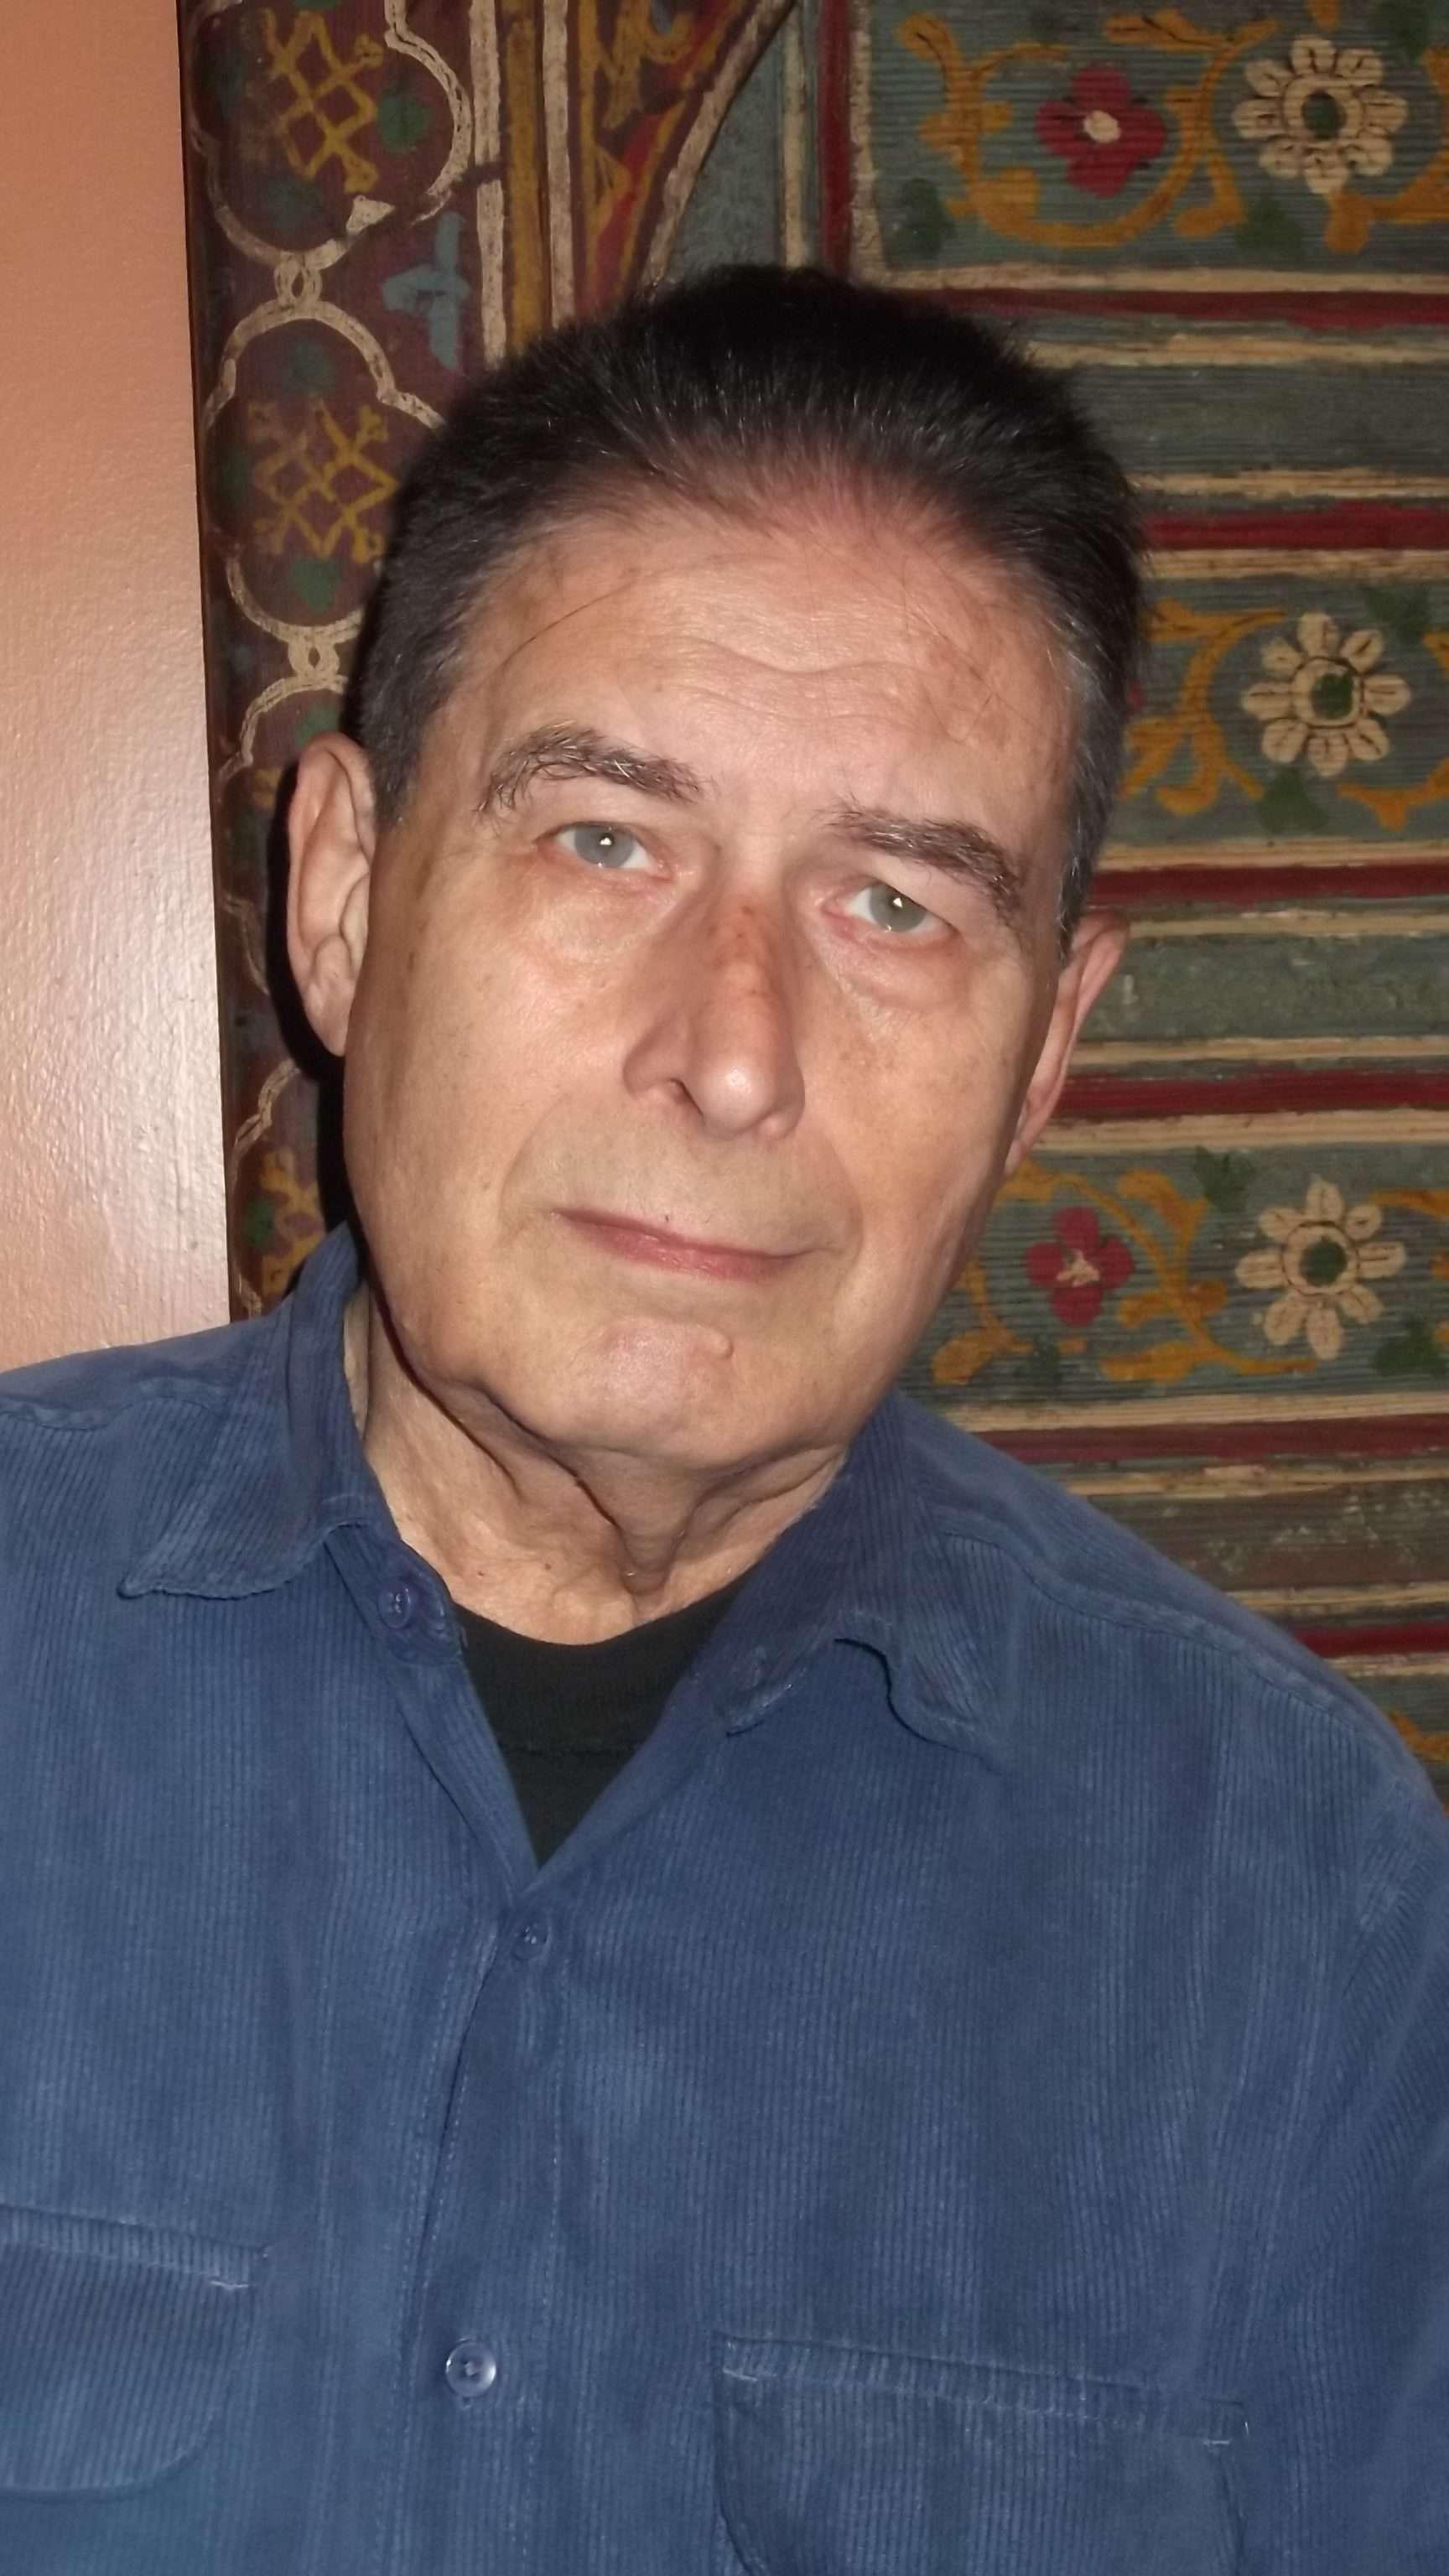 Phillip Ramey